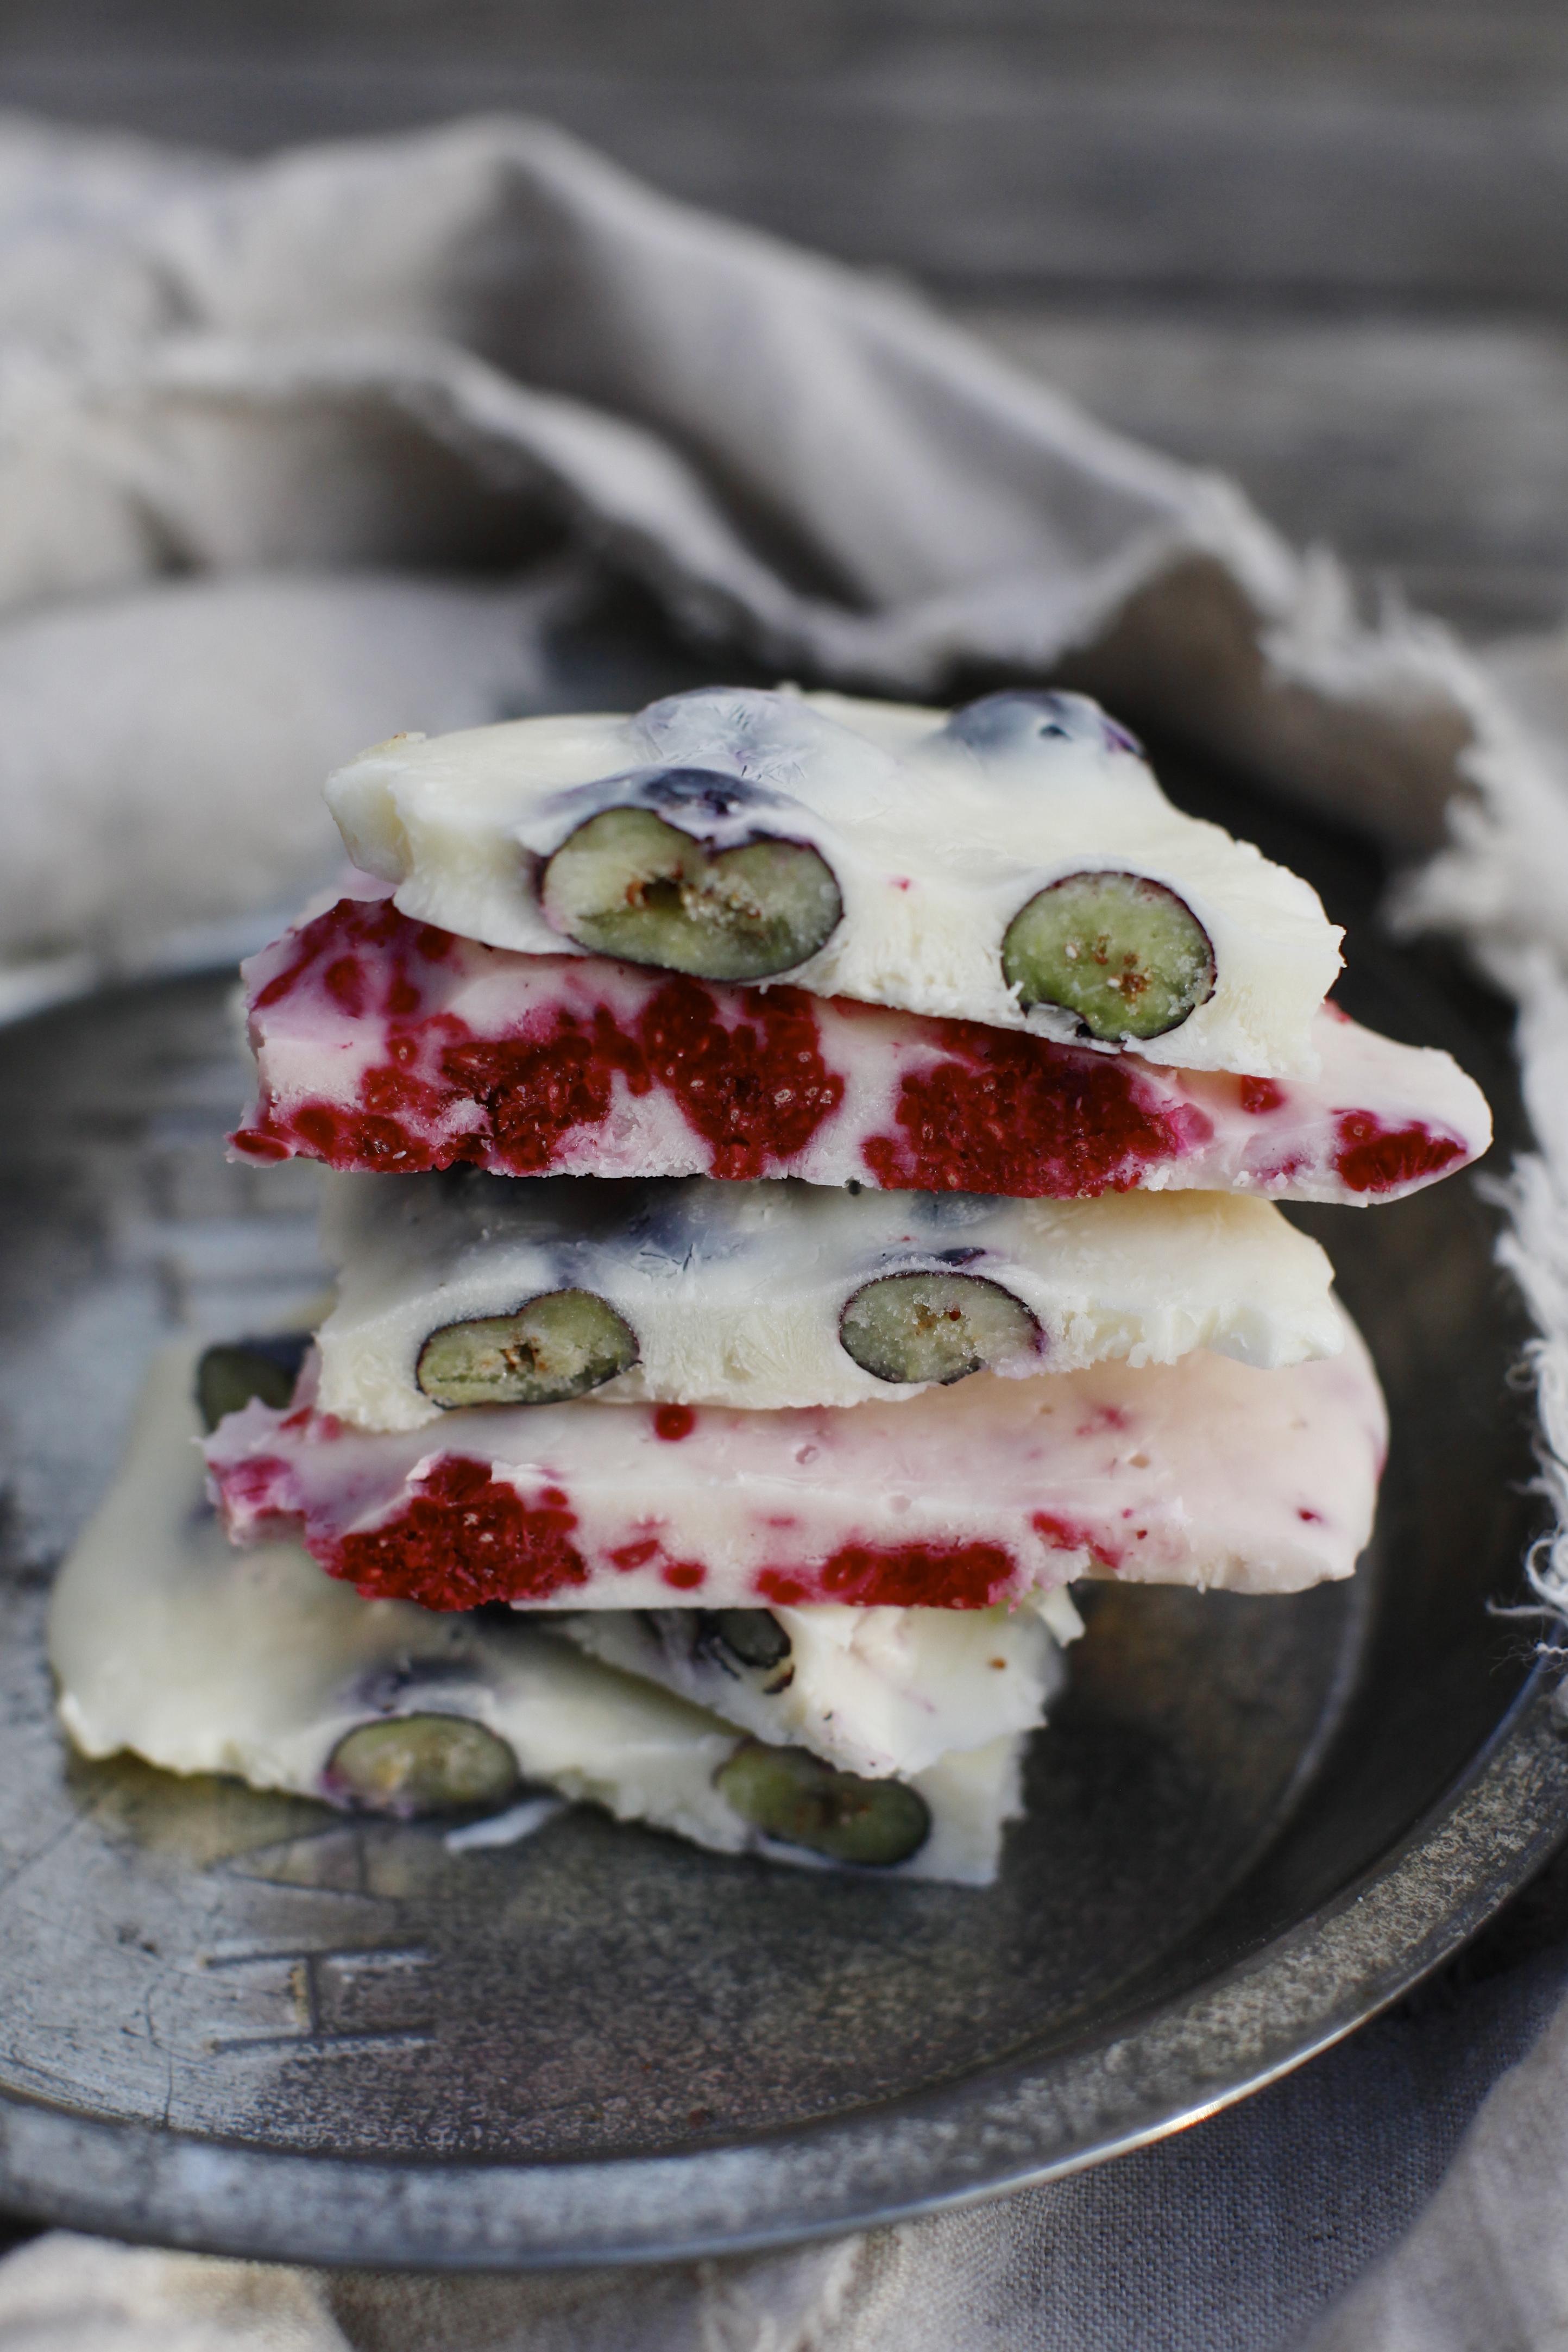 Frozen Yogurt Bark: An Icy, Creamy, Sweet for Summer